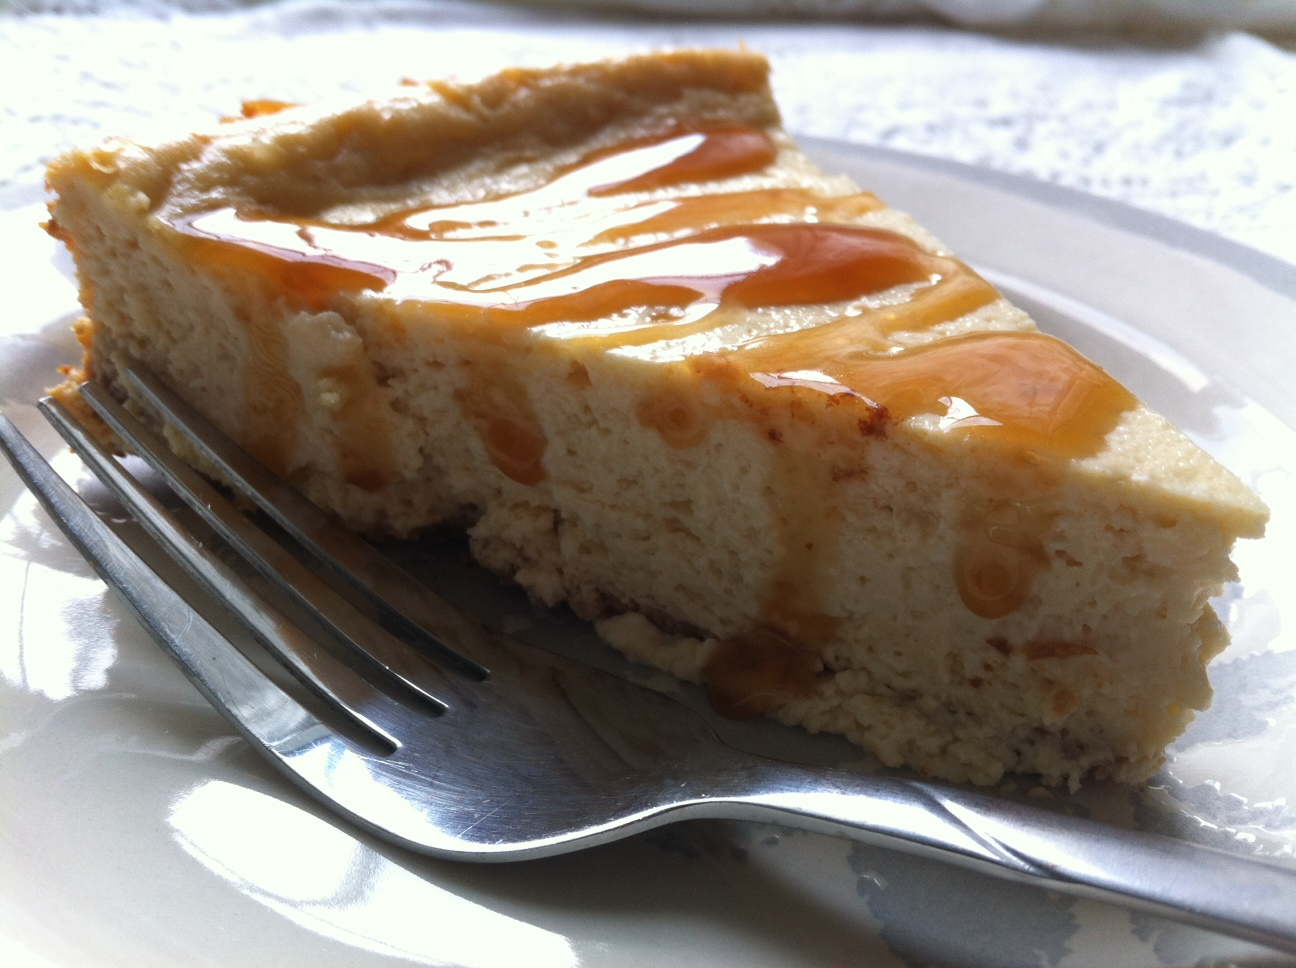 Easy Caramel Dessert Recipes